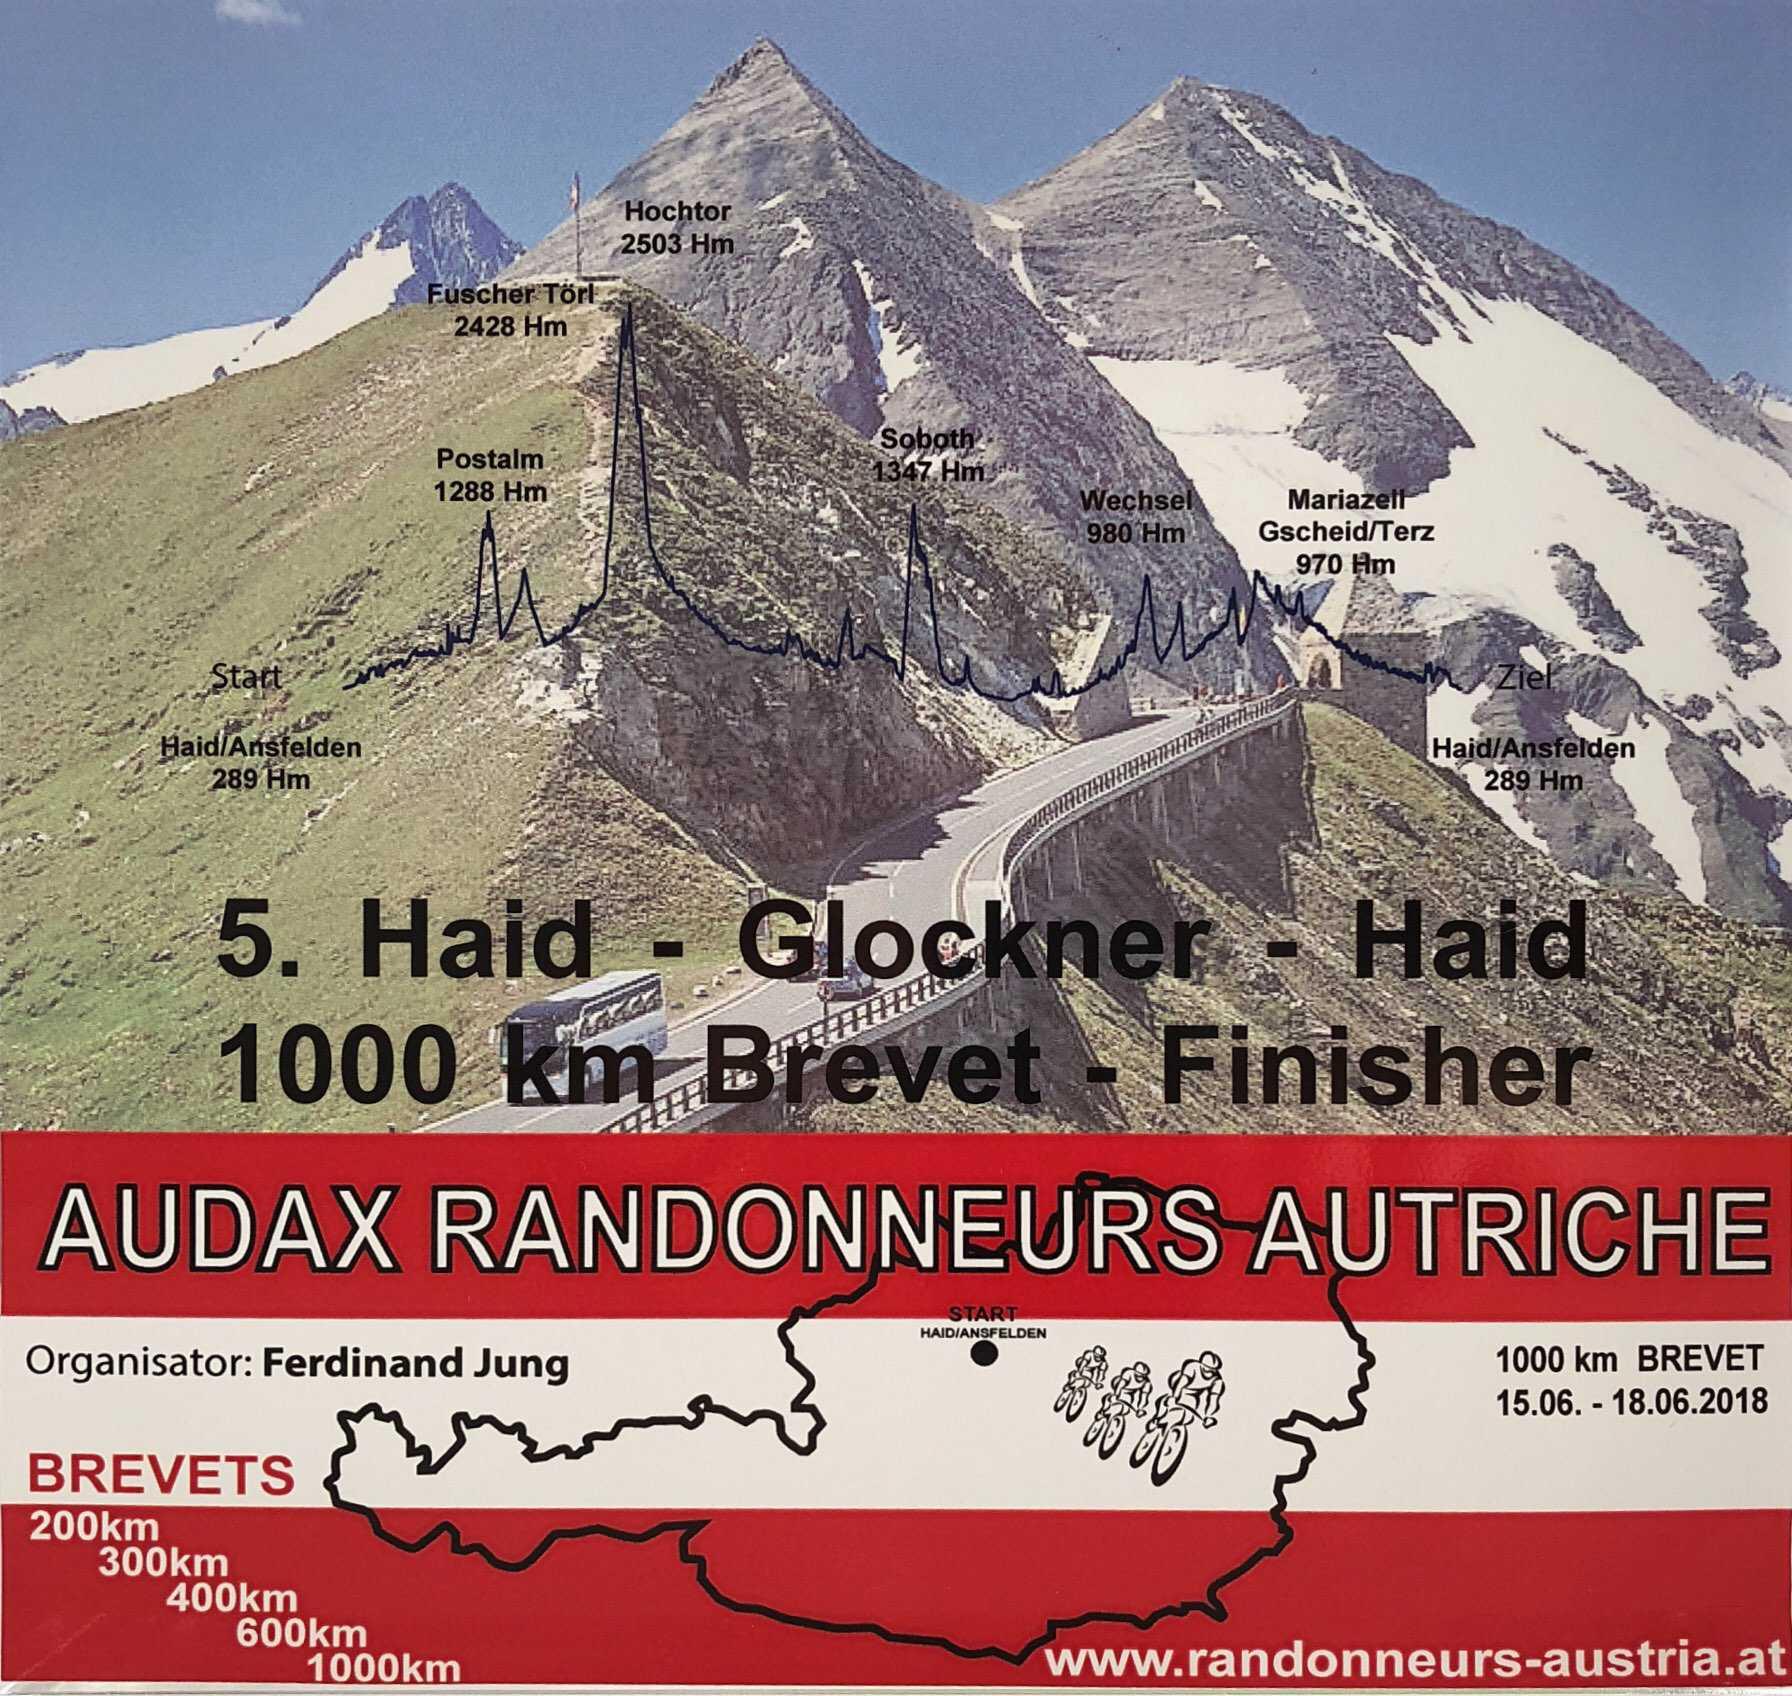 5. Haid-Glockner-Haid 1000 km Brevet – Kurz und bündig!